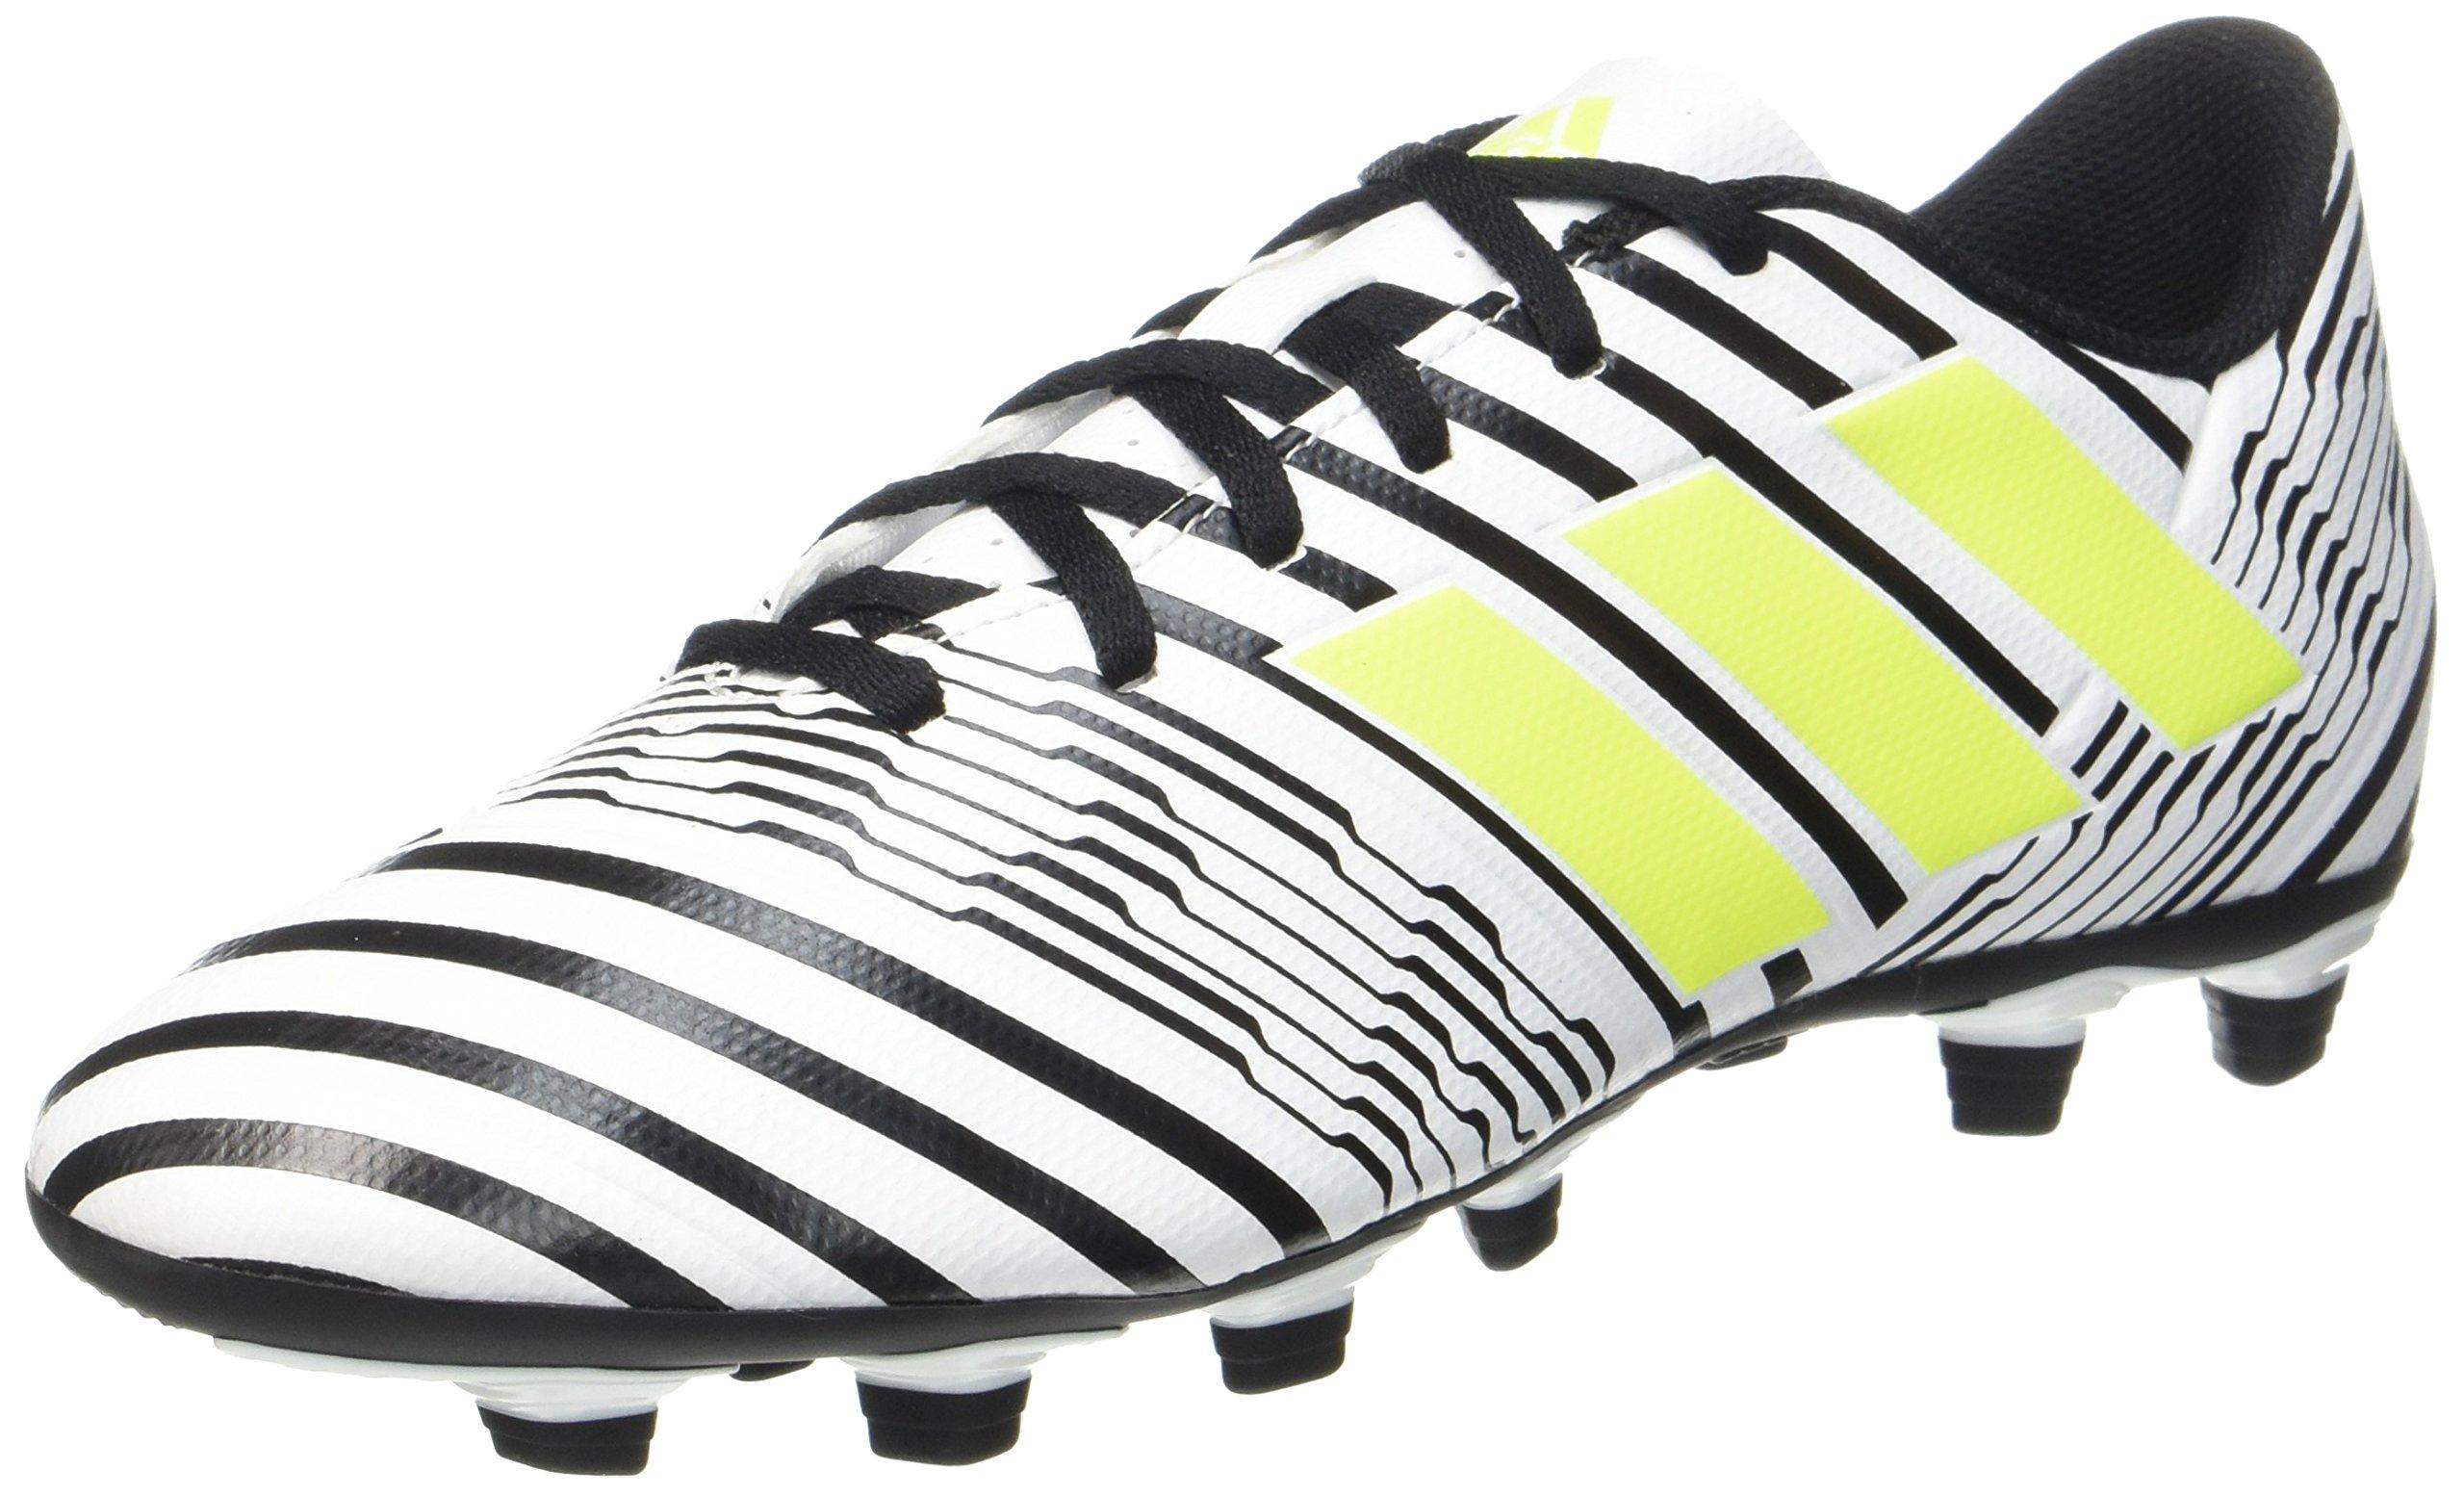 Football Entrainement 17 3 4 Yellow Eu Adidas 2 Nemeziz solar core De FxgChaussures White Black42 HommeBlancfootwear N8nywm0Ov